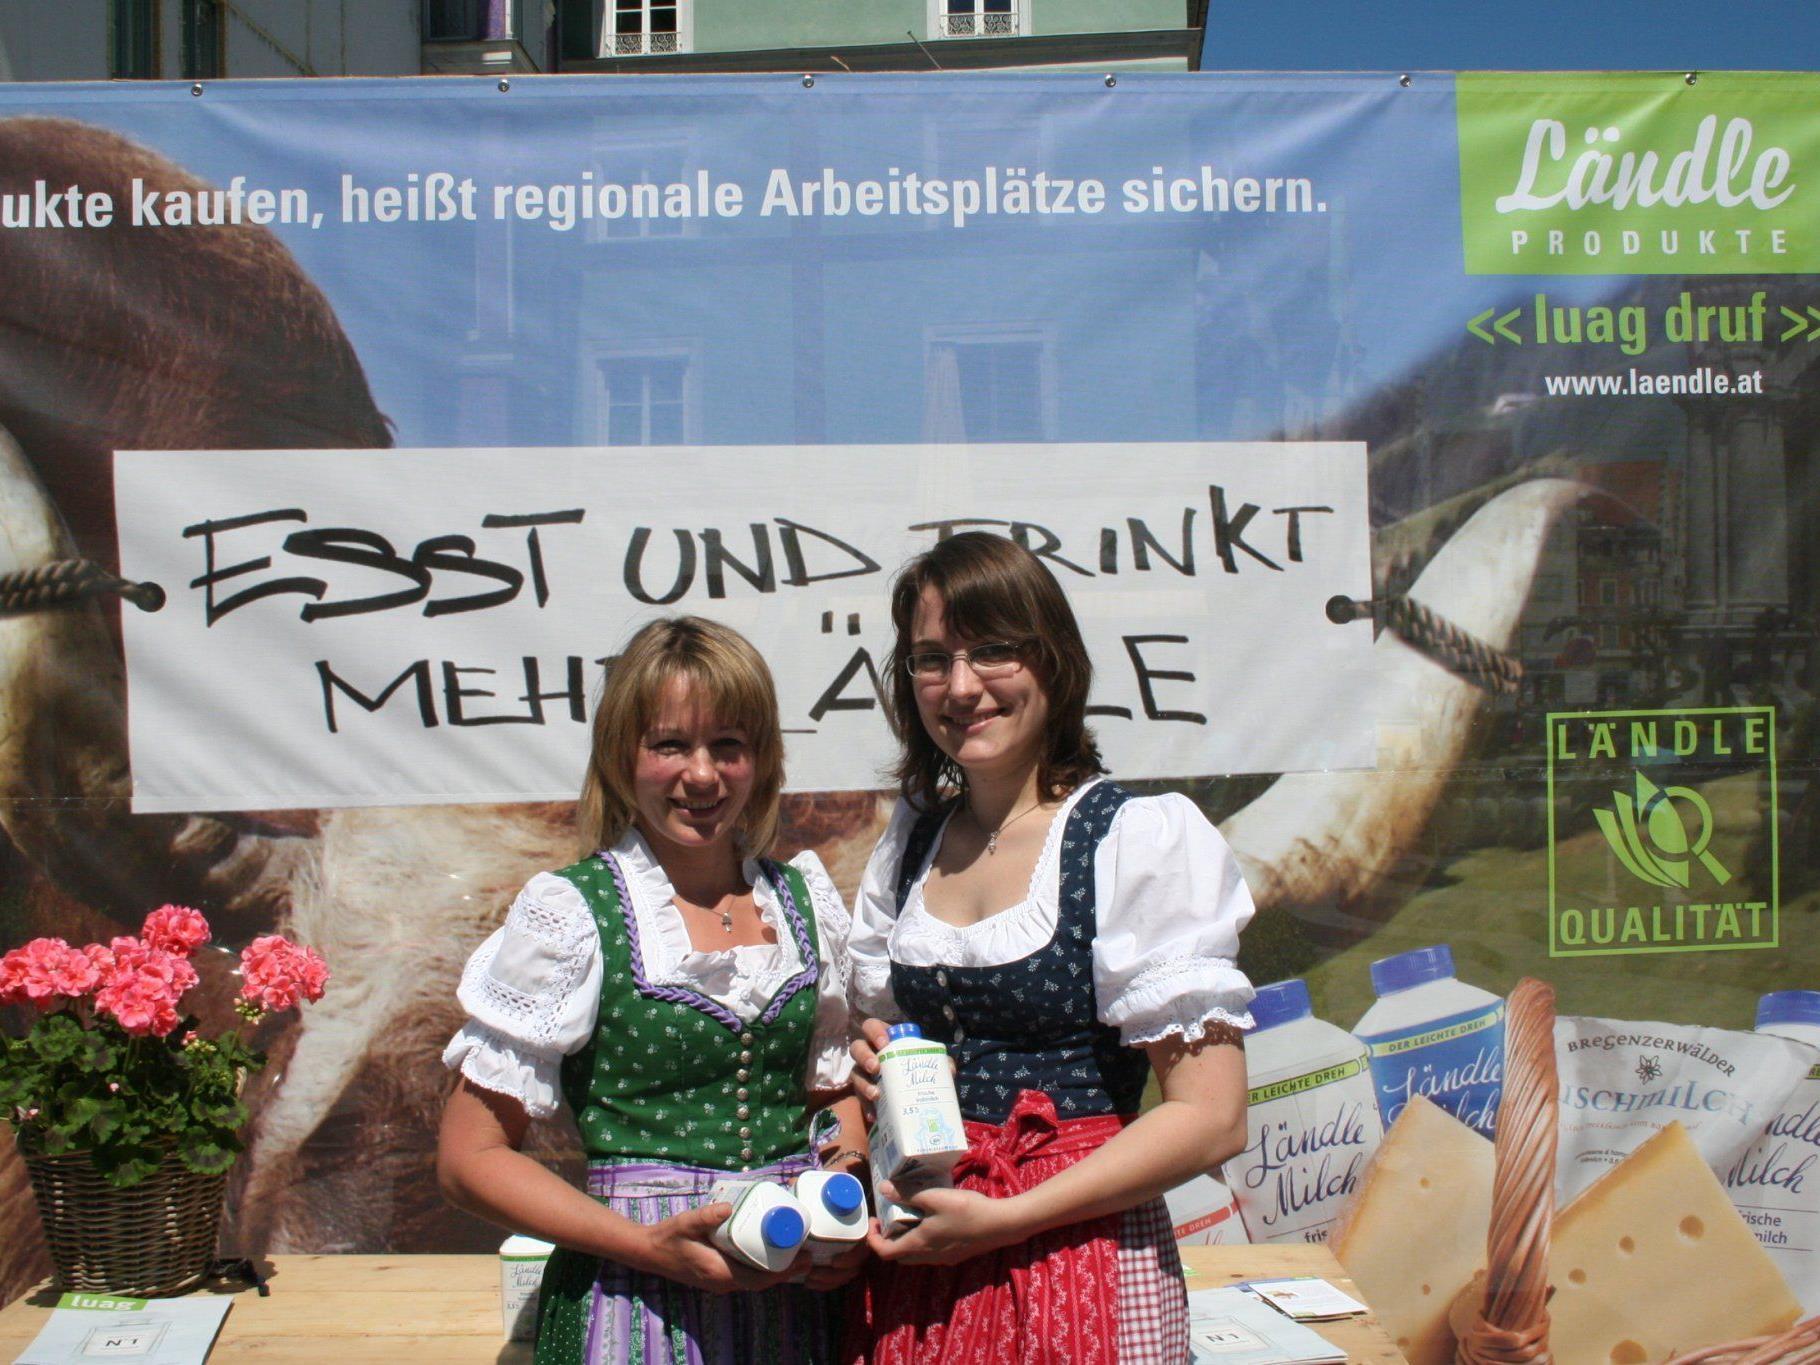 Junge Bäuerinnen in Aktion am Weltmilchtag.